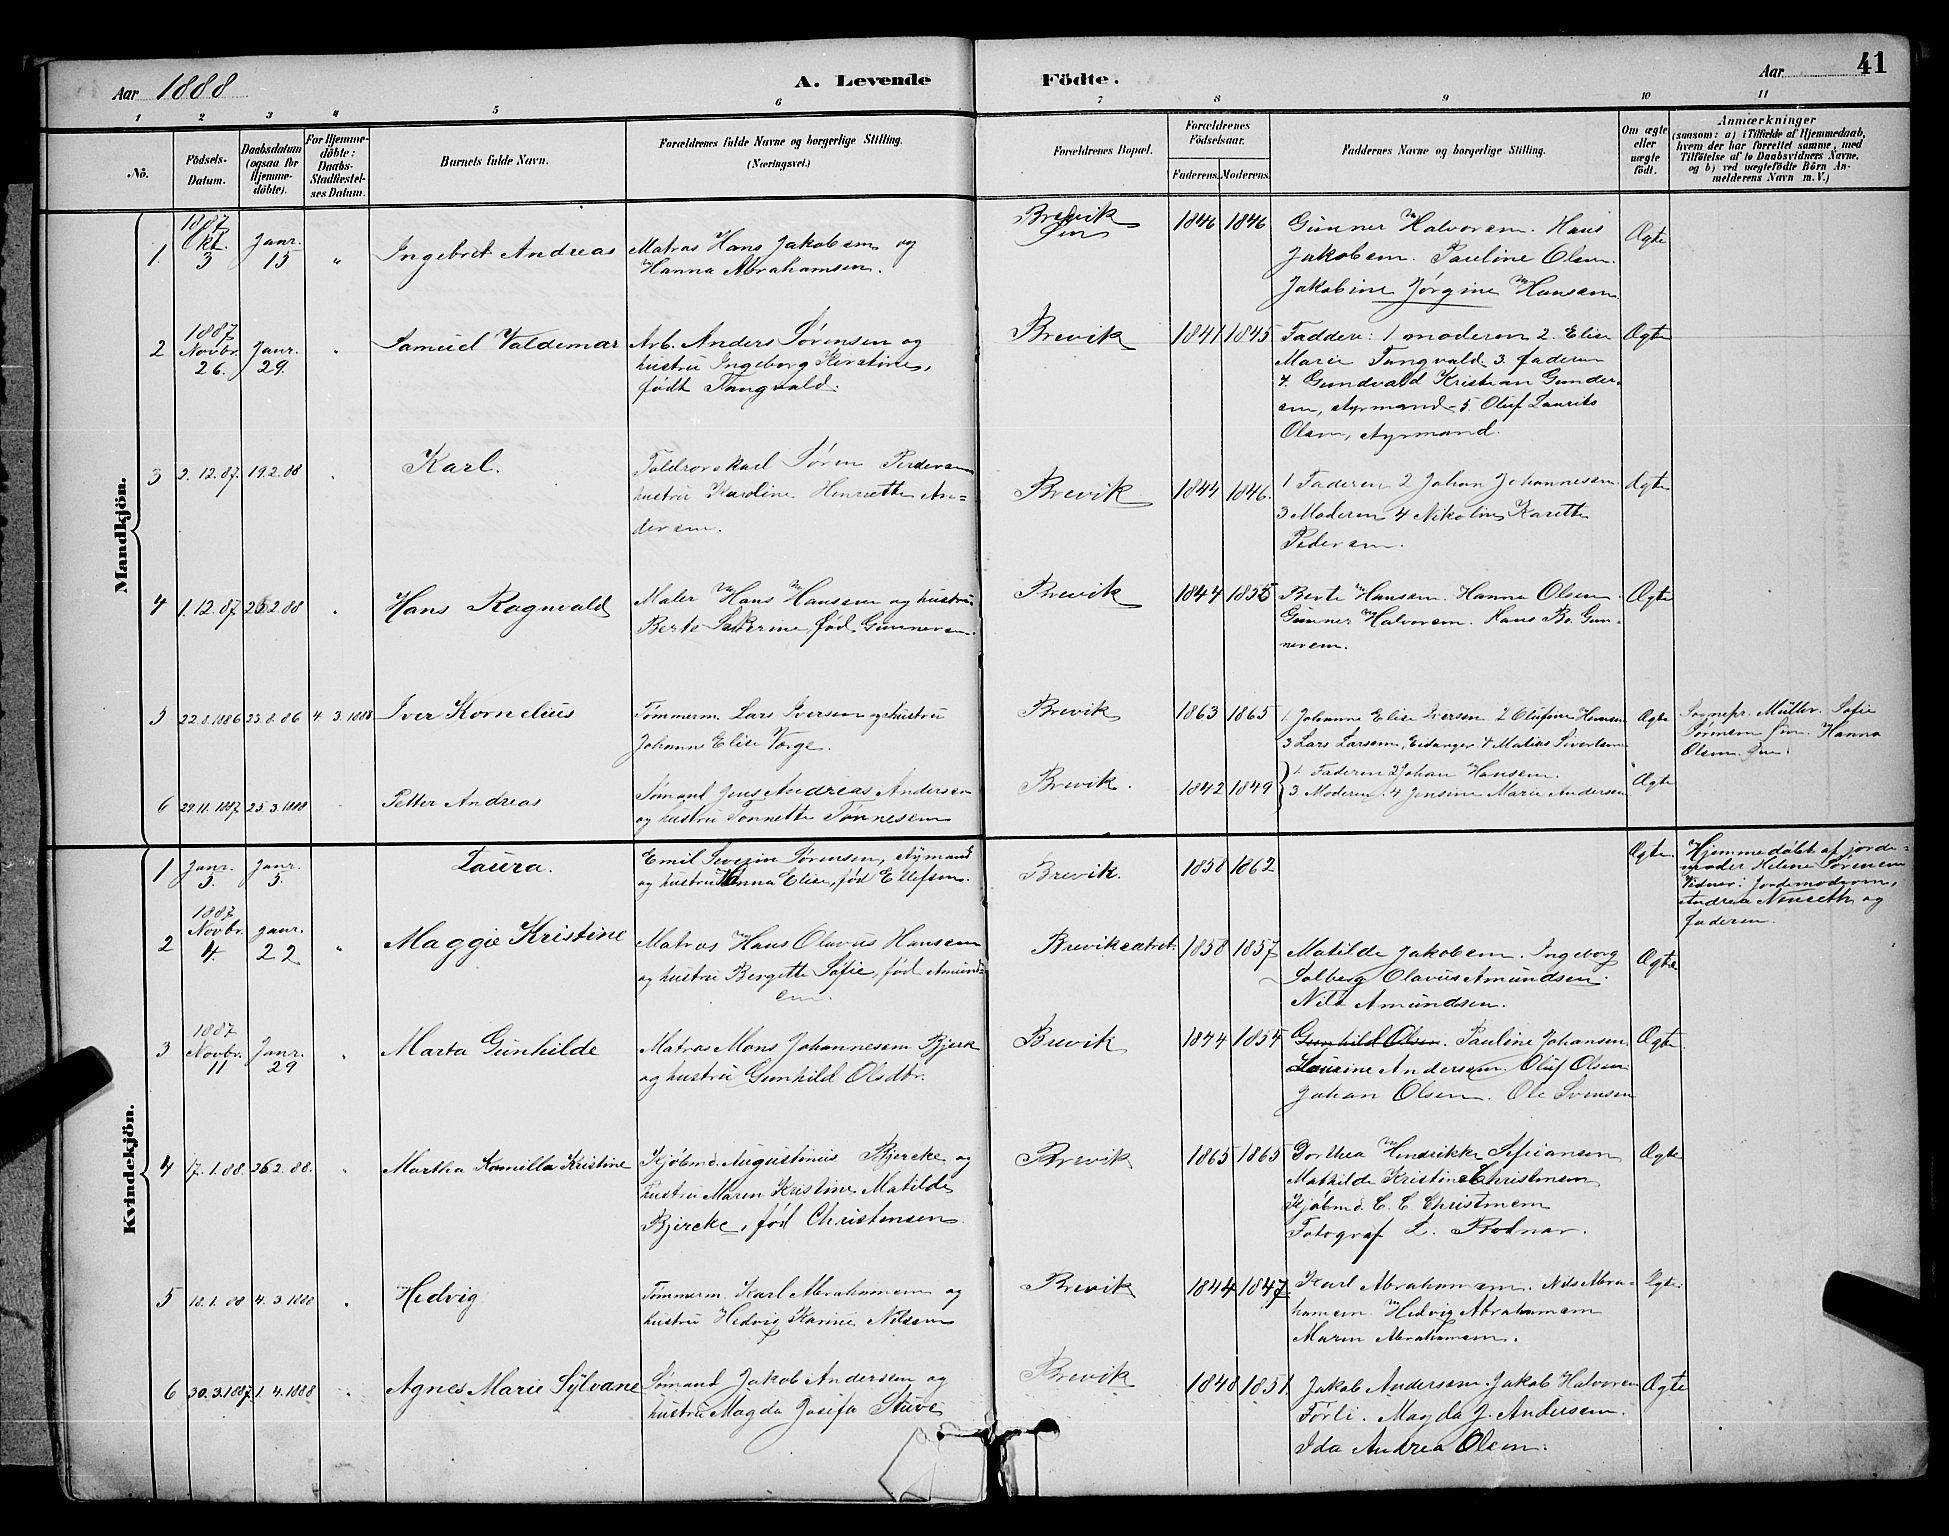 SAKO, Brevik kirkebøker, G/Ga/L0004: Klokkerbok nr. 4, 1882-1900, s. 41